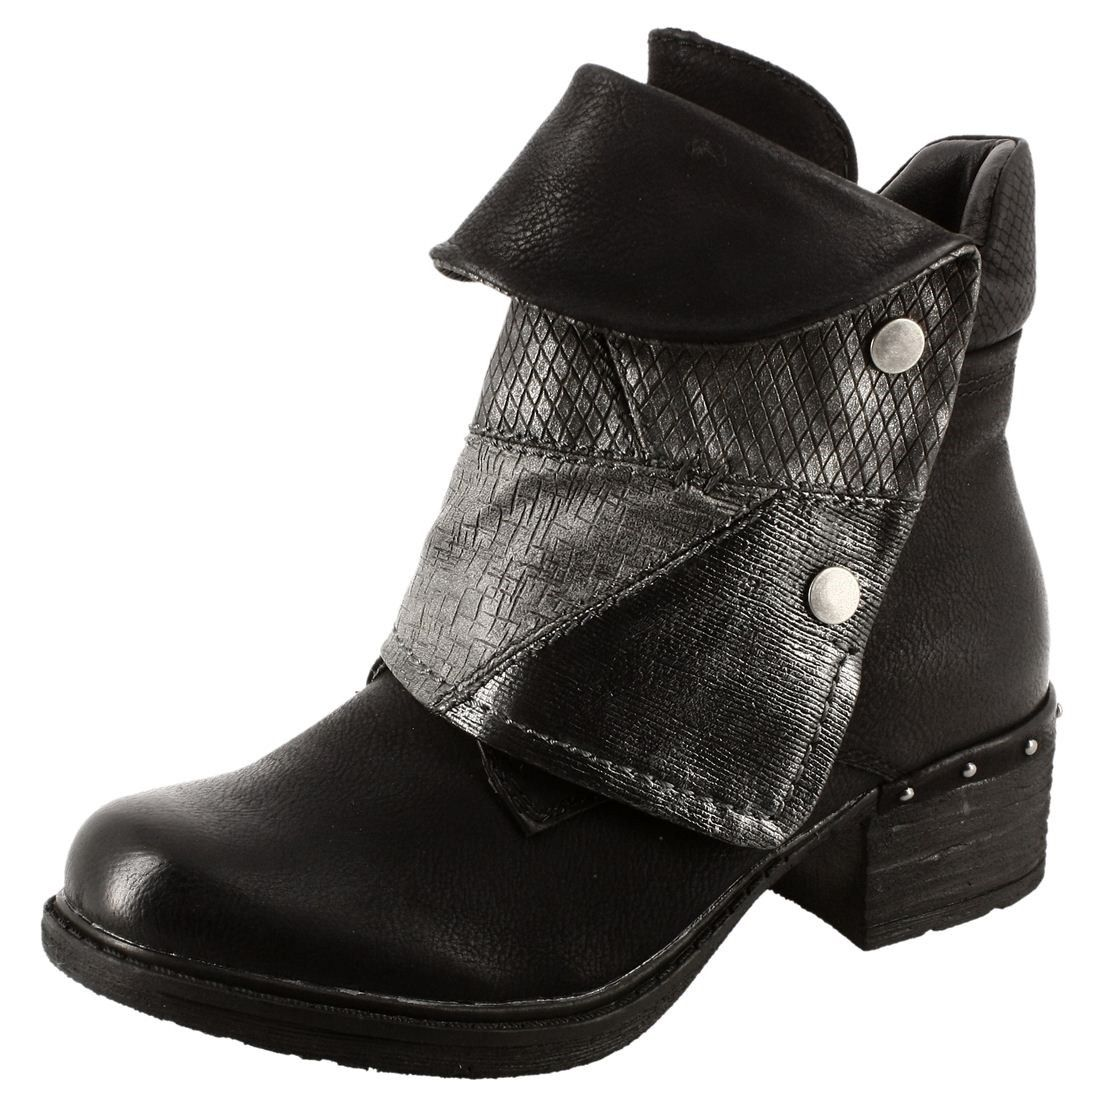 RIEKER bottes bottines bottes d'HIVER y1553-01 Noir Neuf ObbzvJc